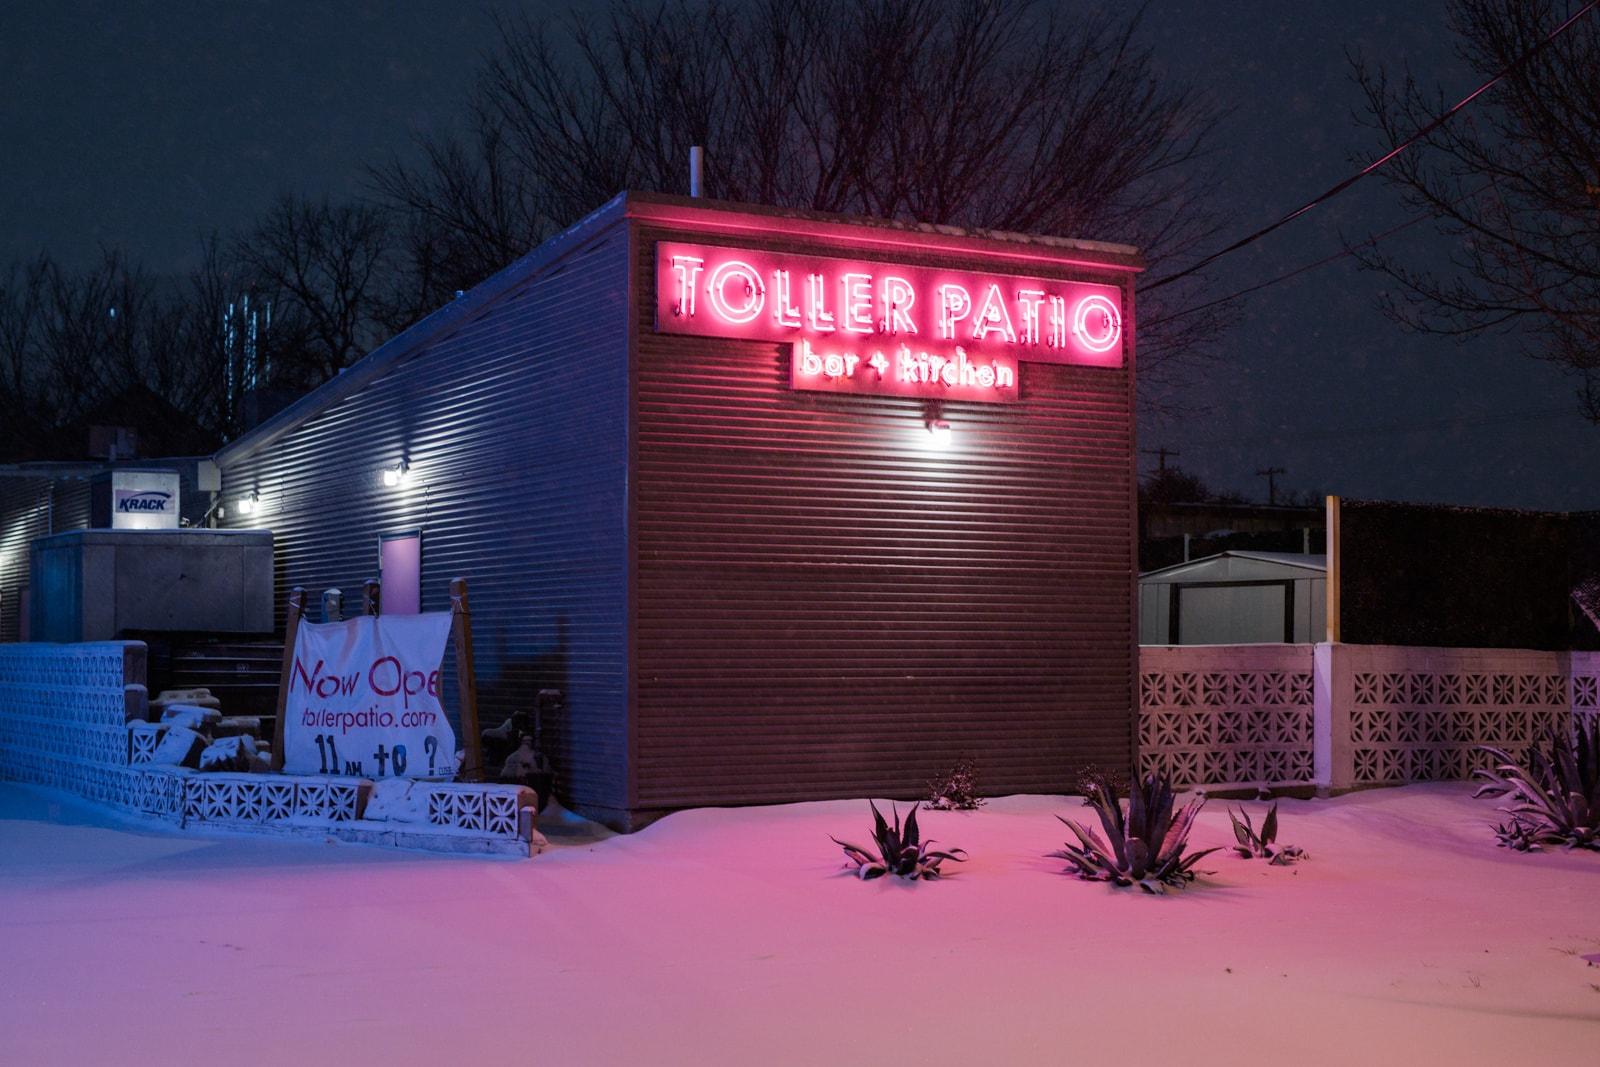 dallas snow storm 2021 photos of